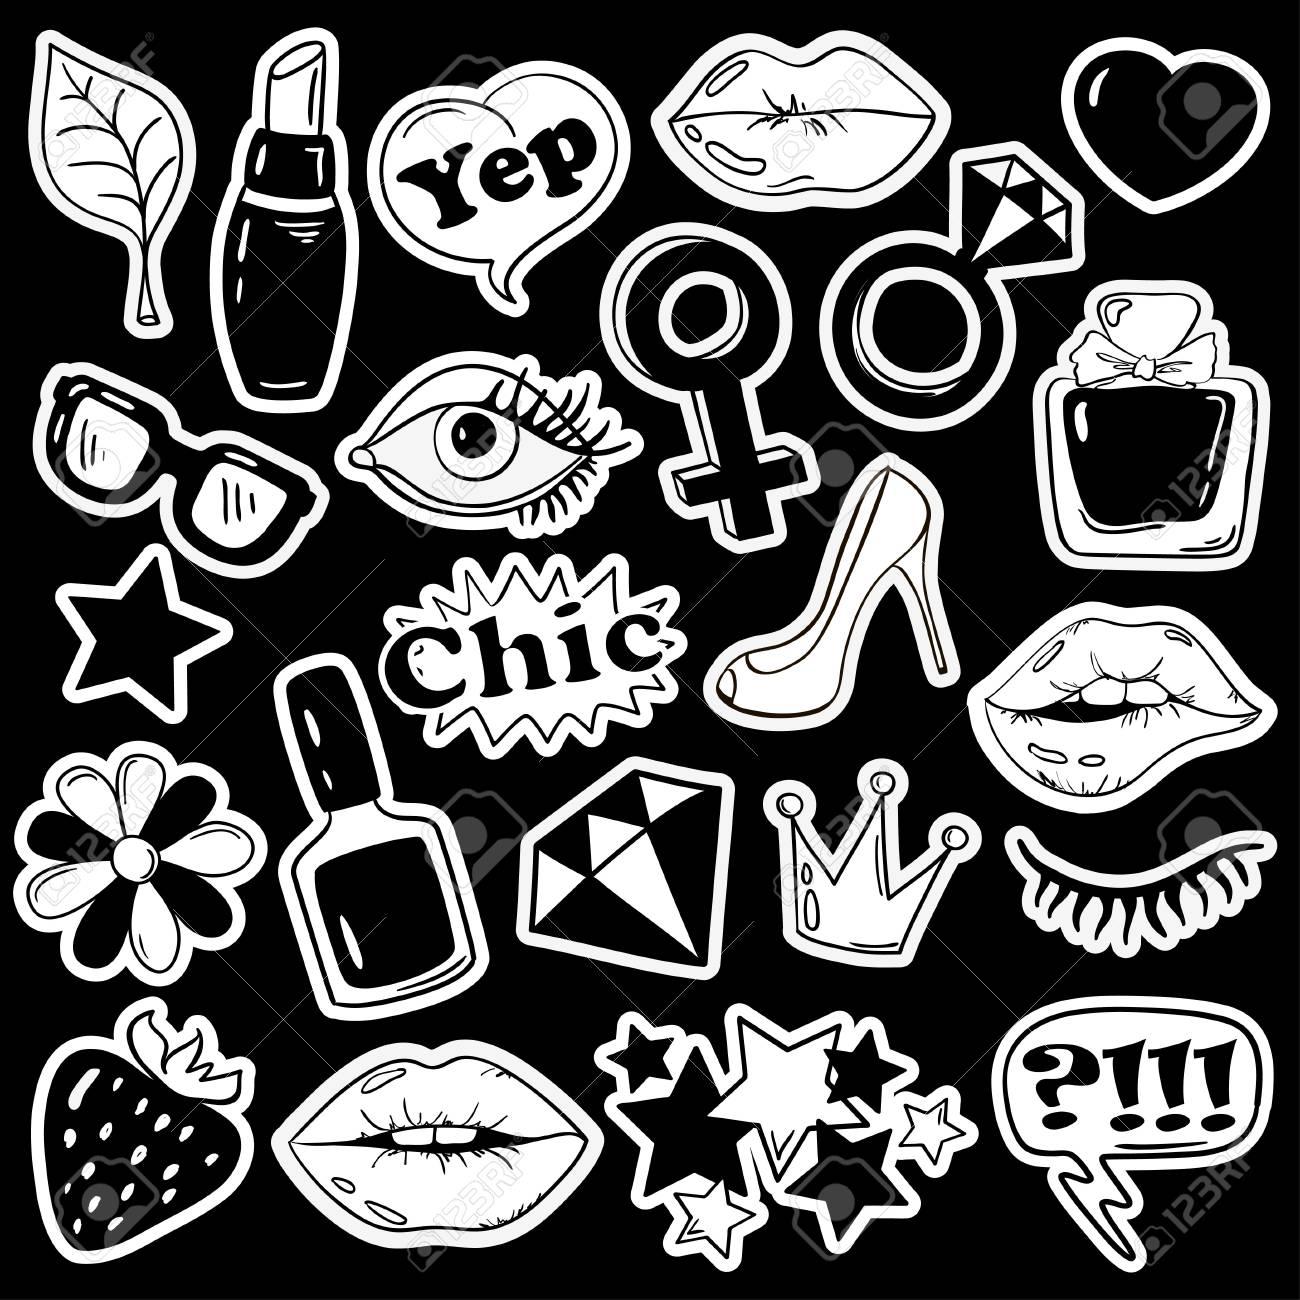 Black and white fun set of girls fashion stickers icons emoji pins or